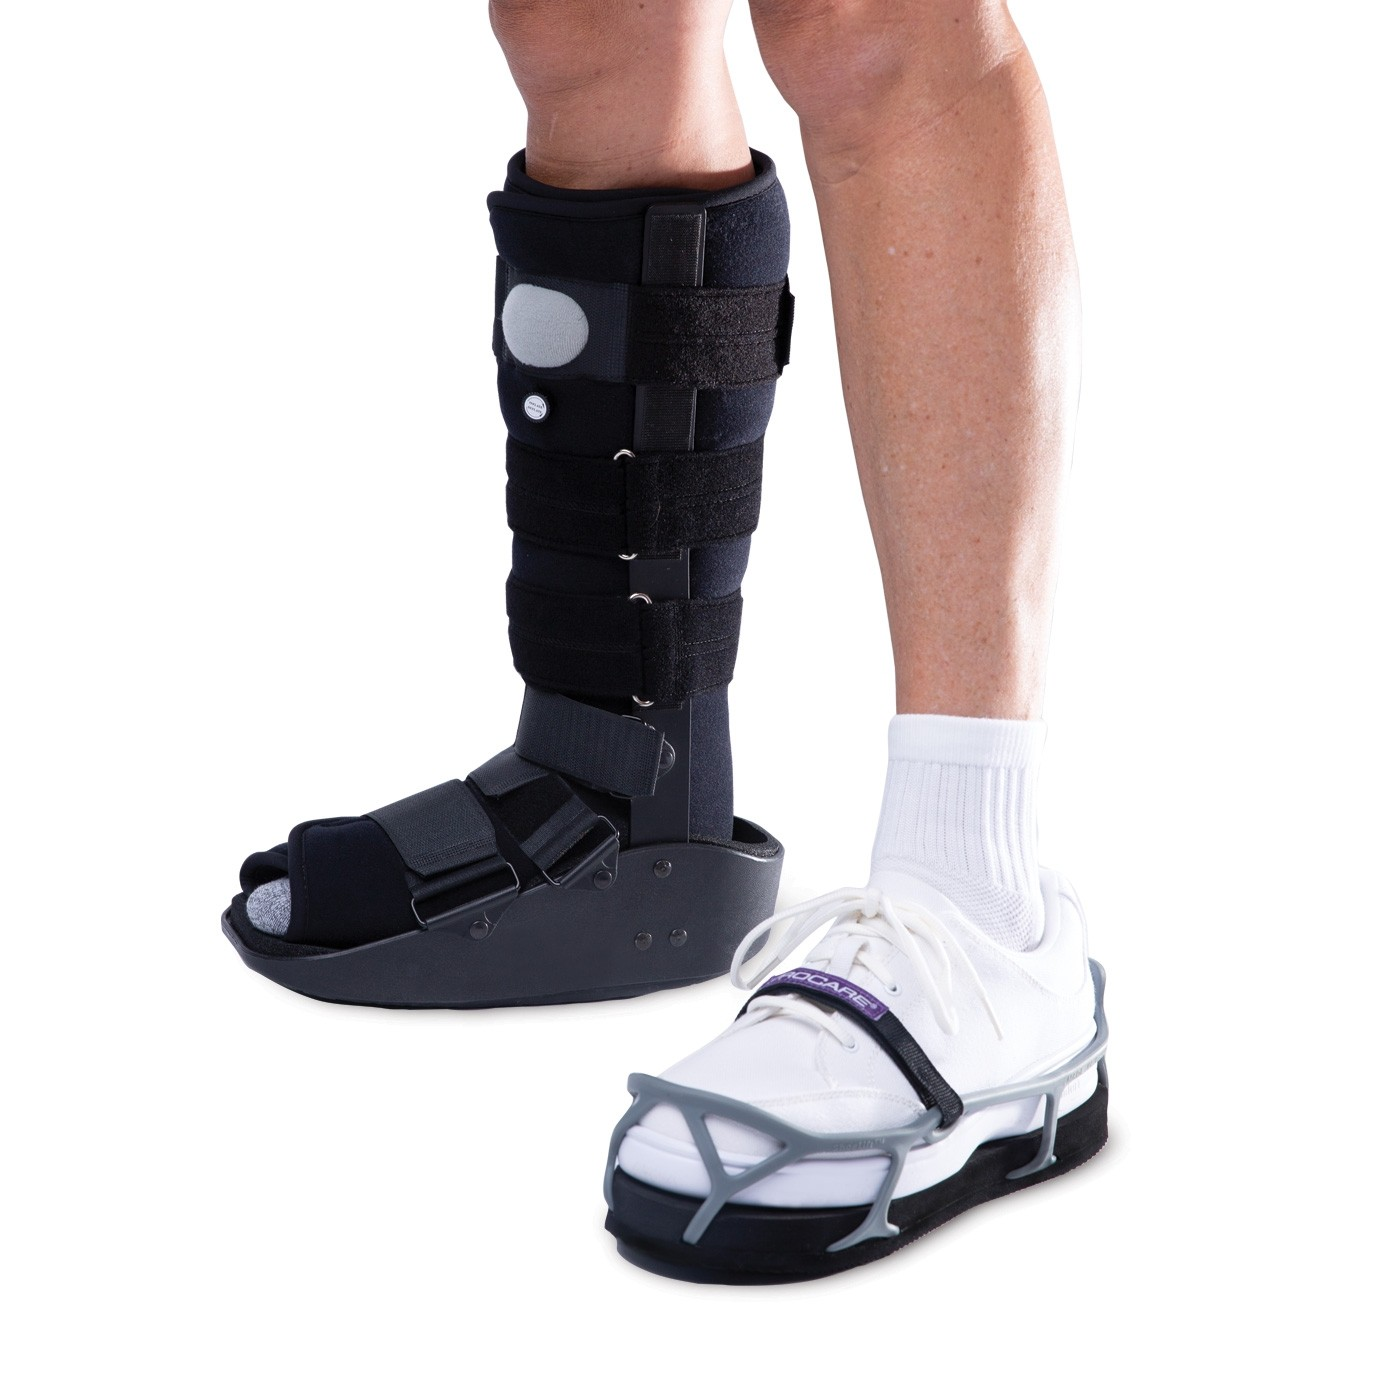 Healvaluefit Shoe Leveler Shoe Lift Shoe Balancer for Walking Boot Height Enhancing Shoe Small